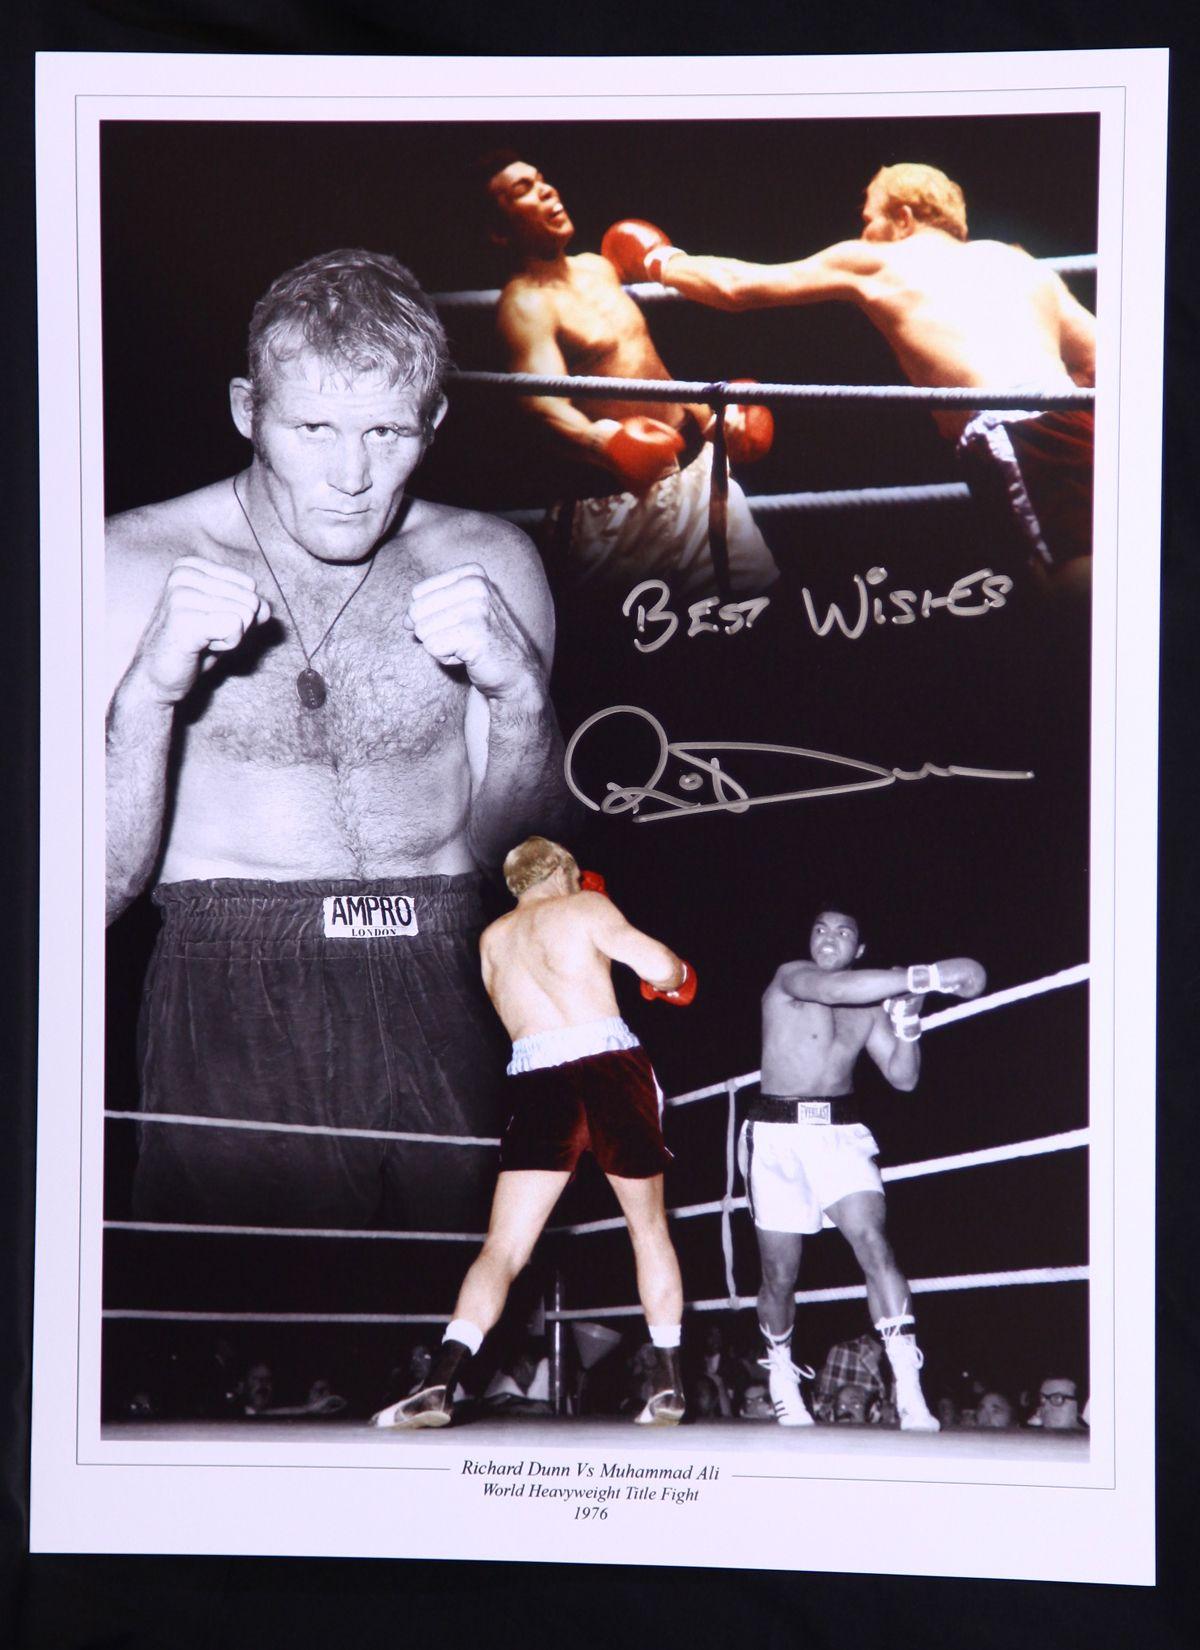 Richard Dunn Boxing Signed 12x16 Photograph